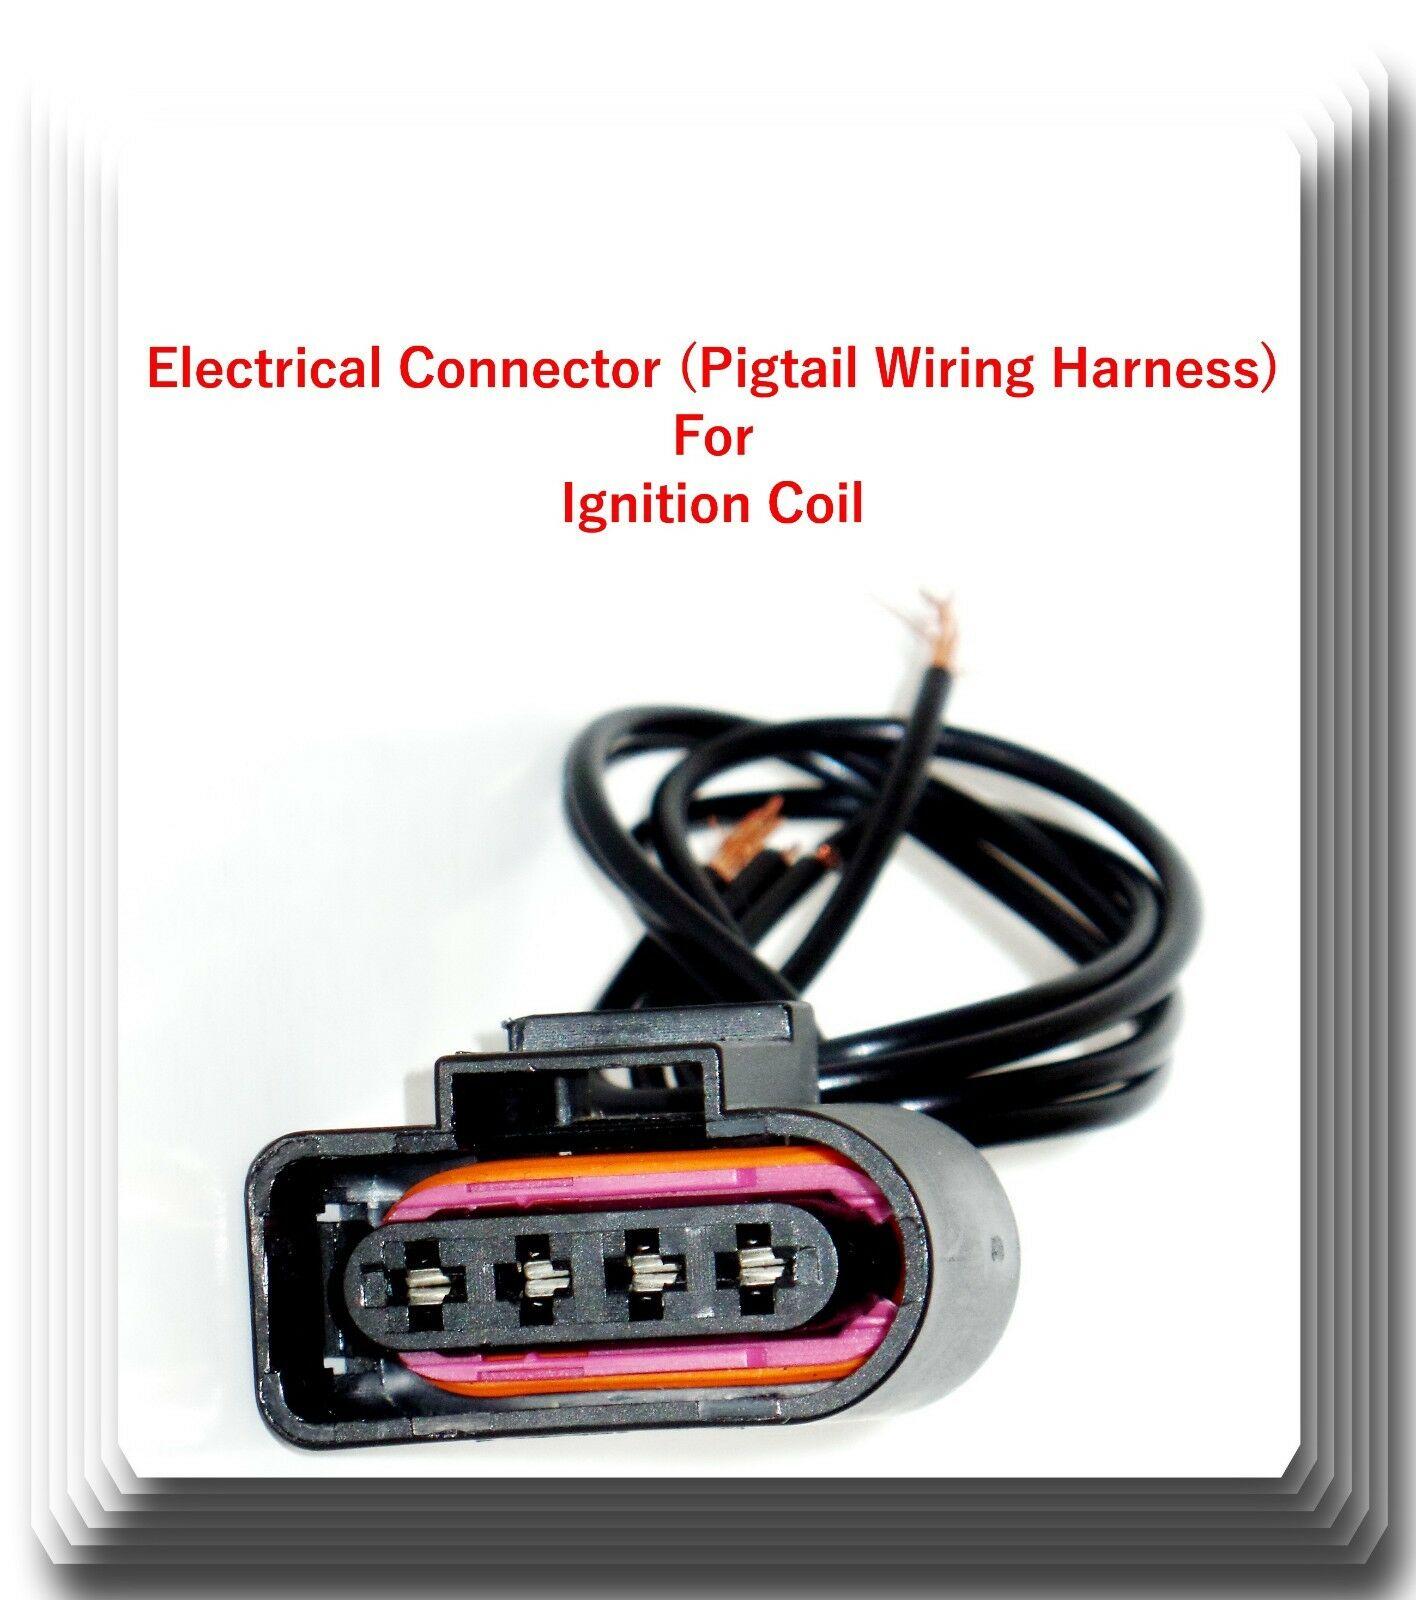 99 Hyundai Elantra Coil Connector Wiring Color - Wiring Diagram Schematic -  hondaa-accordd.2014ok.jeanjaures37.fr | 99 Hyundai Elantra Coil Connector Wiring Color |  | Wiring Diagram Resource